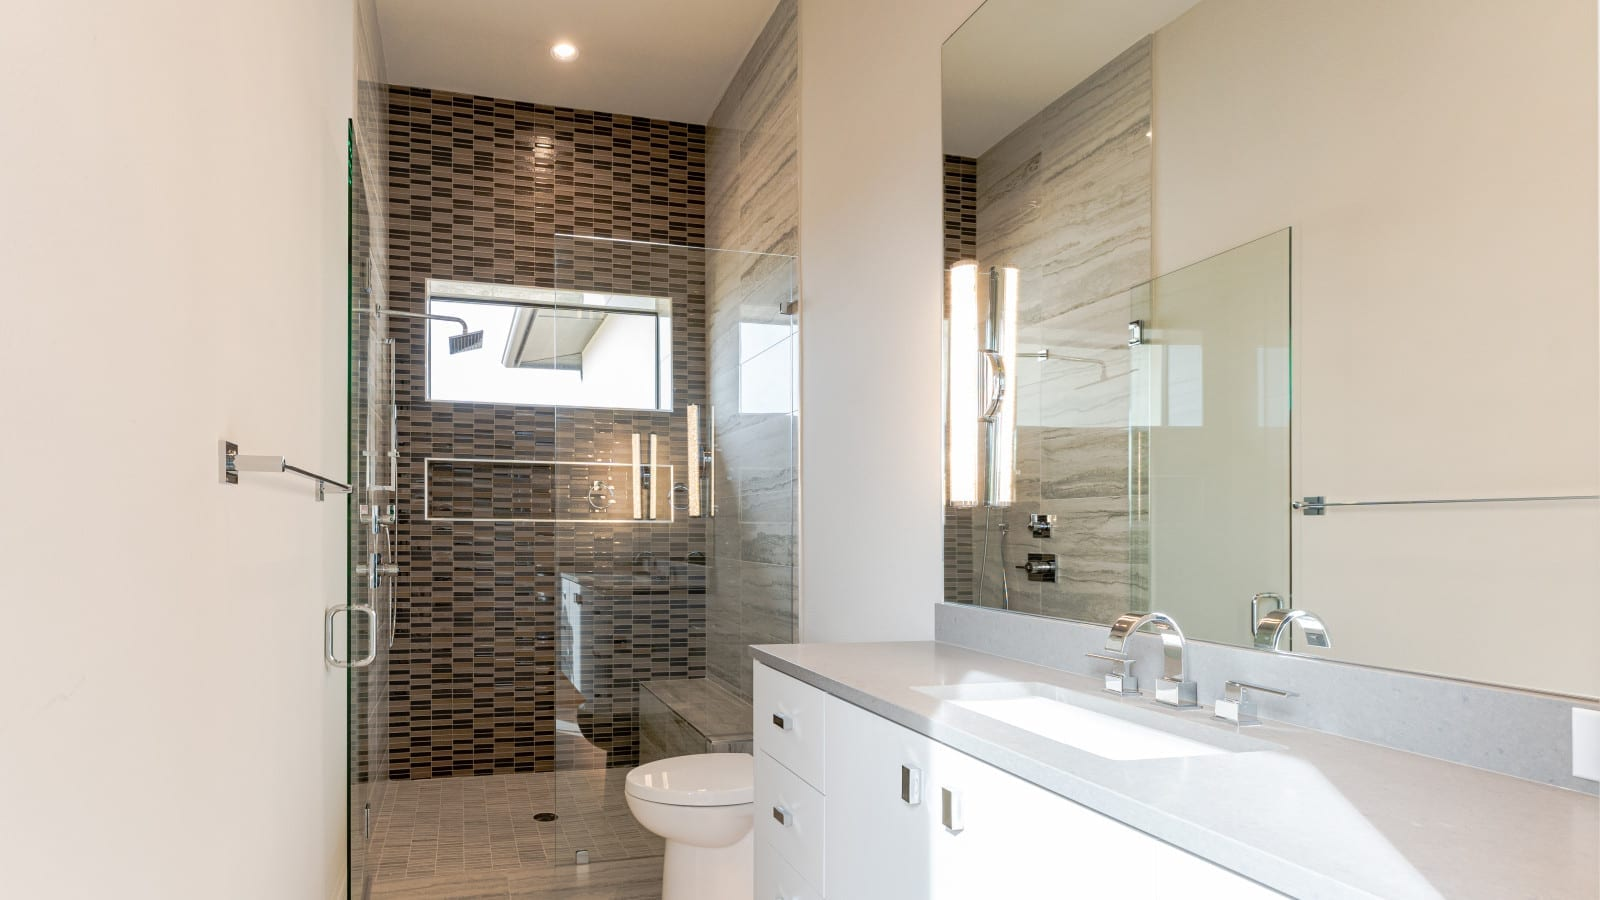 Modern Style Homes design # 28 - Millennial Design + Build